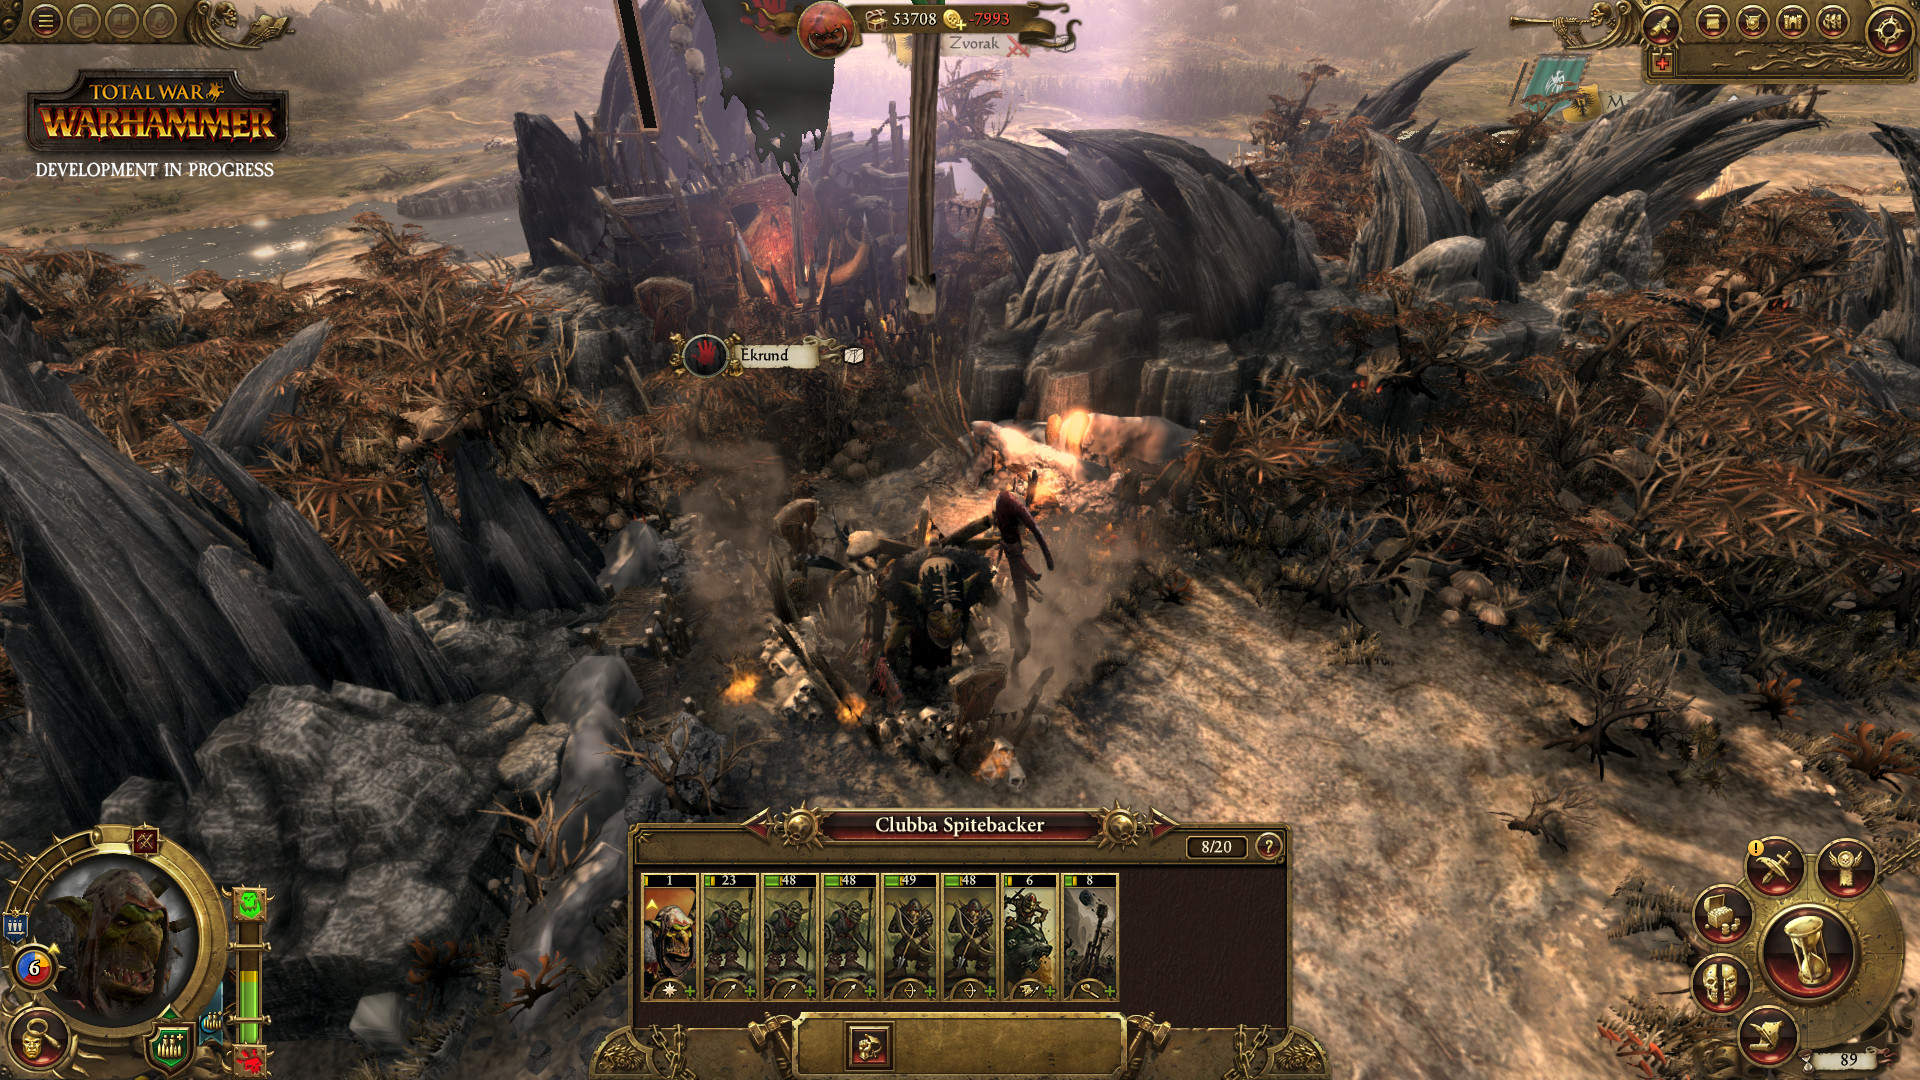 Warhammer clipart 1080p Total Total Warhammer Pay2Play Warhammer